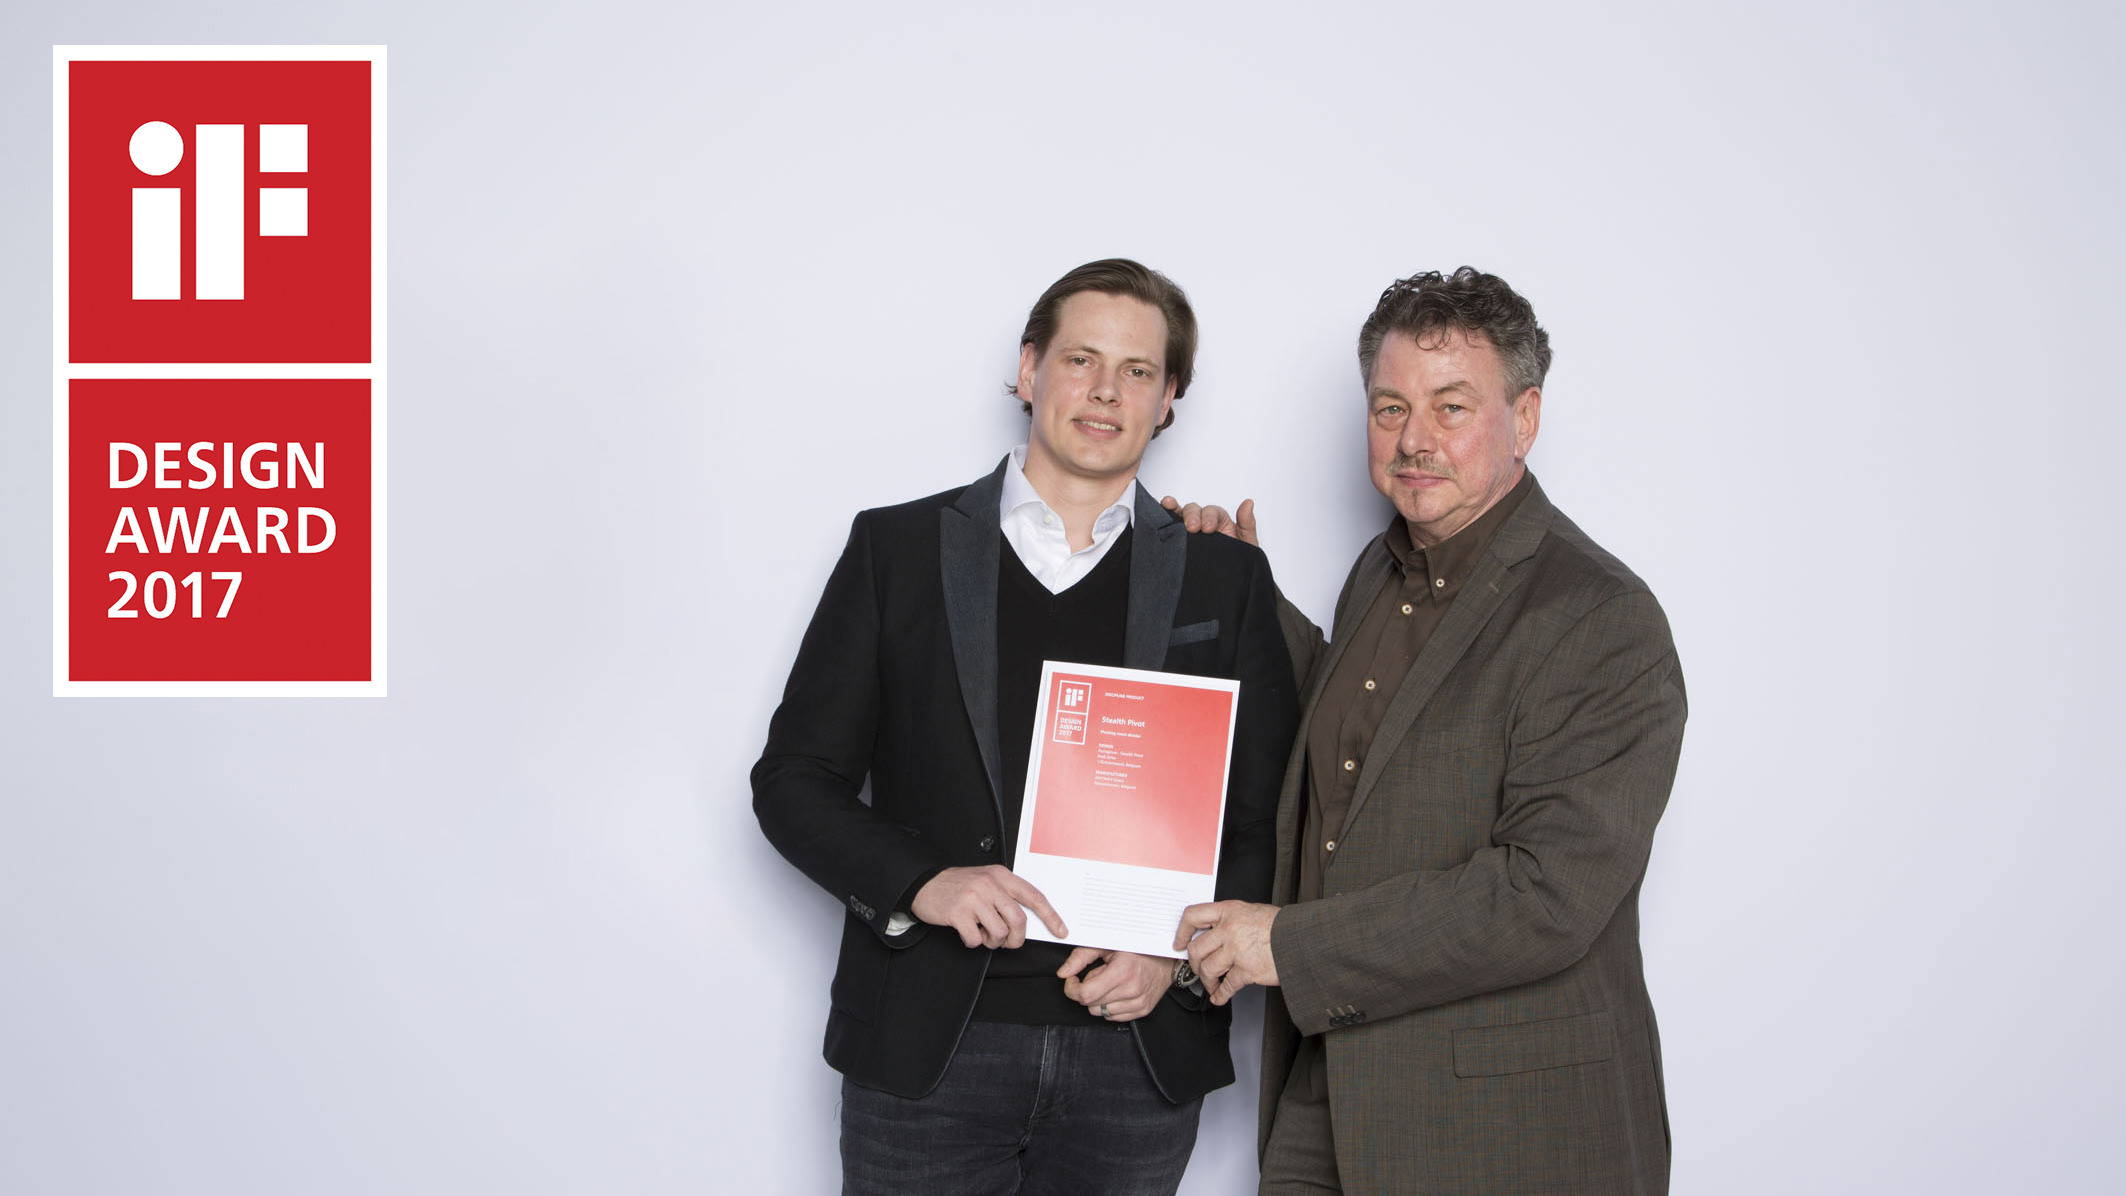 Rudi Dries and Koen Dries at the iF design award 2017